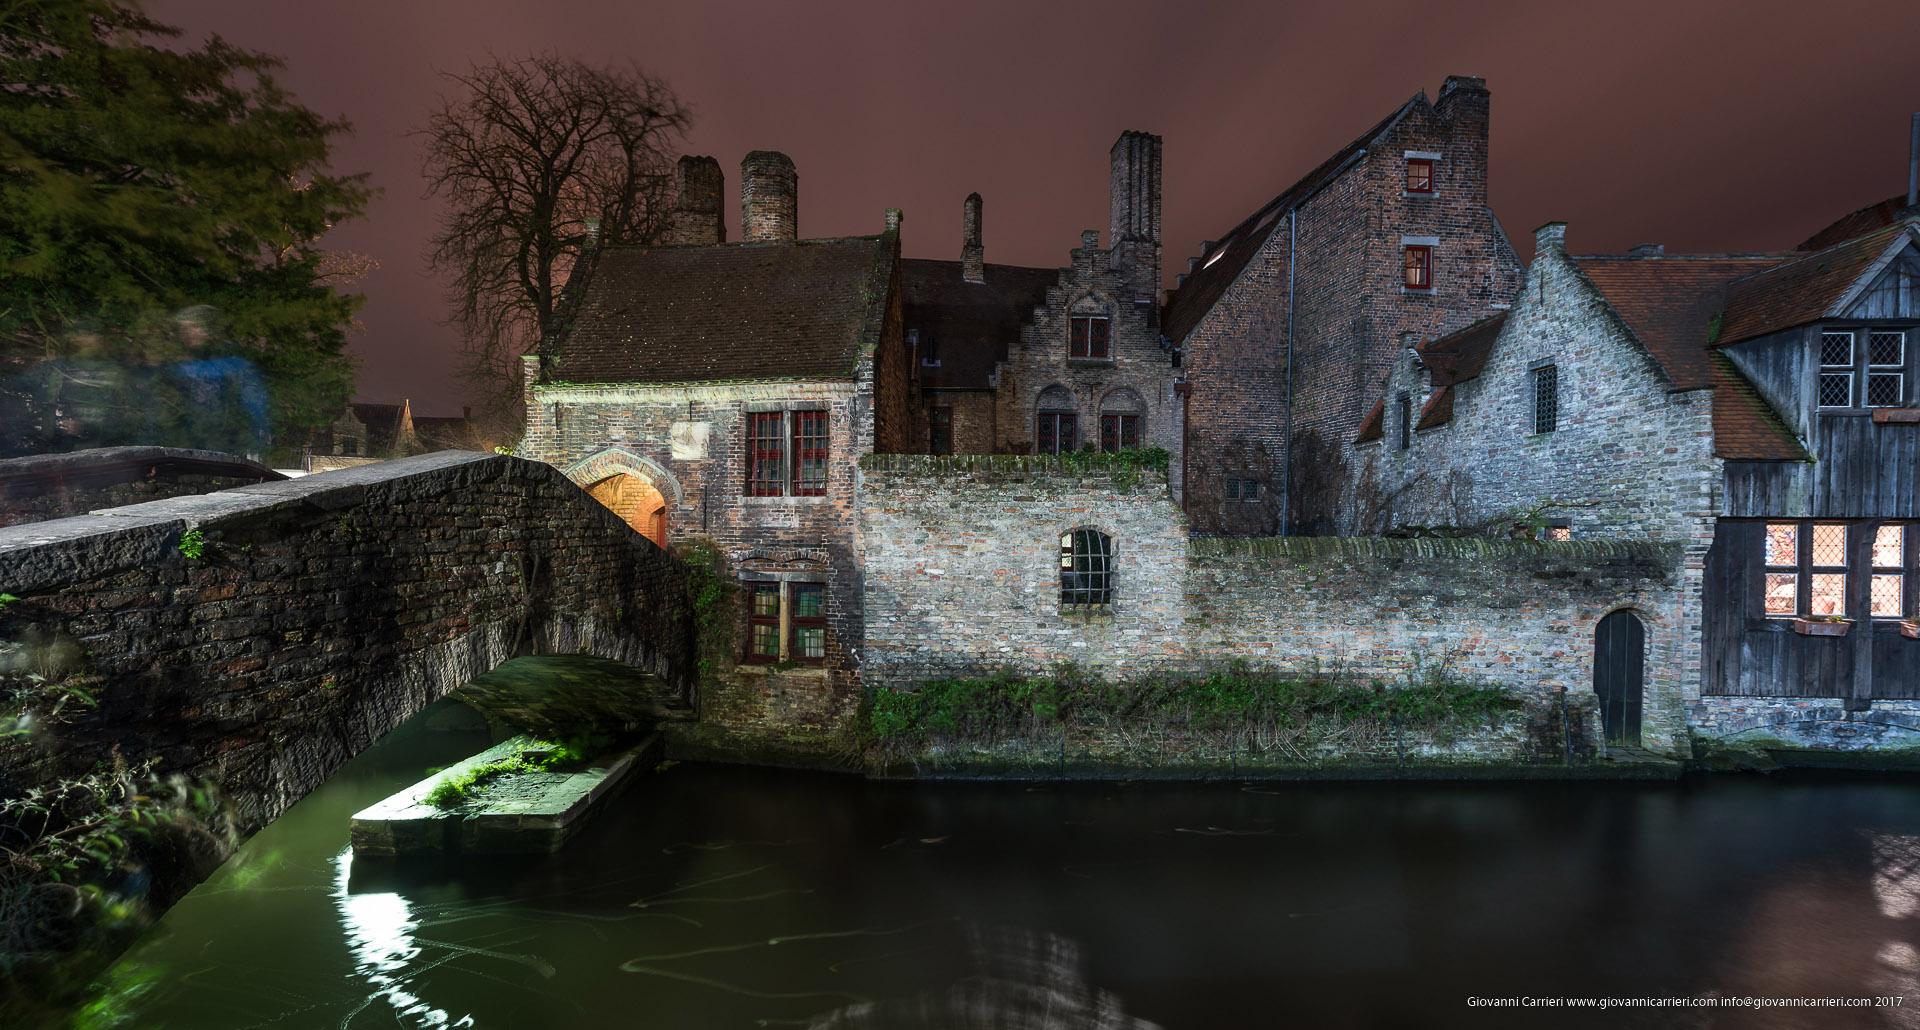 Piccolo ponte situato tra la chiesa Madonna e il parco Gruuthuse, Bruges